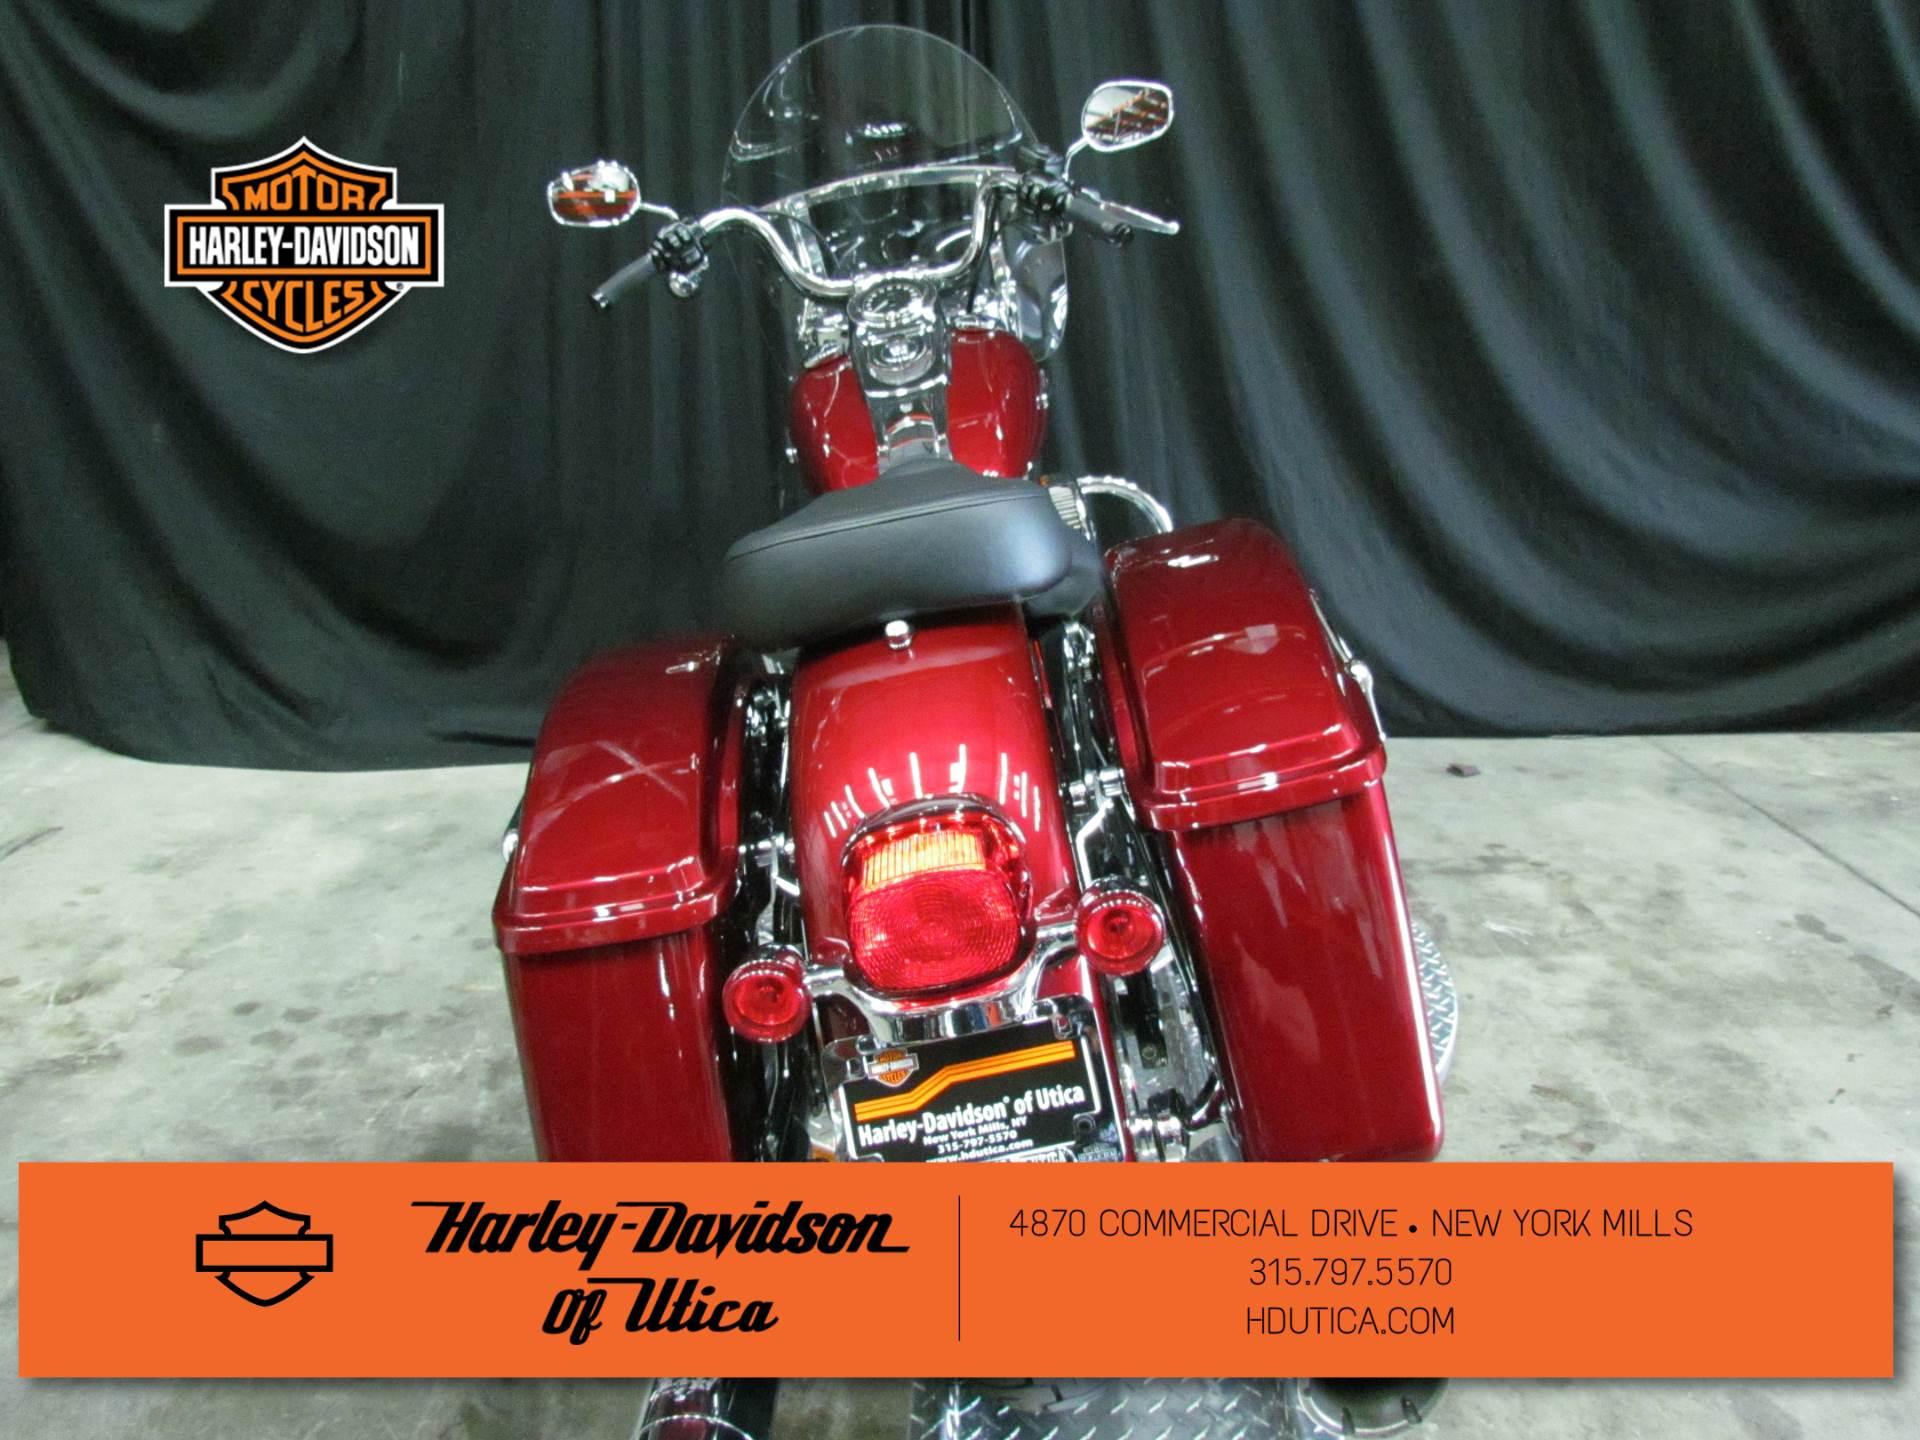 2016 Harley-Davidson Switchback™ in New York Mills, New York